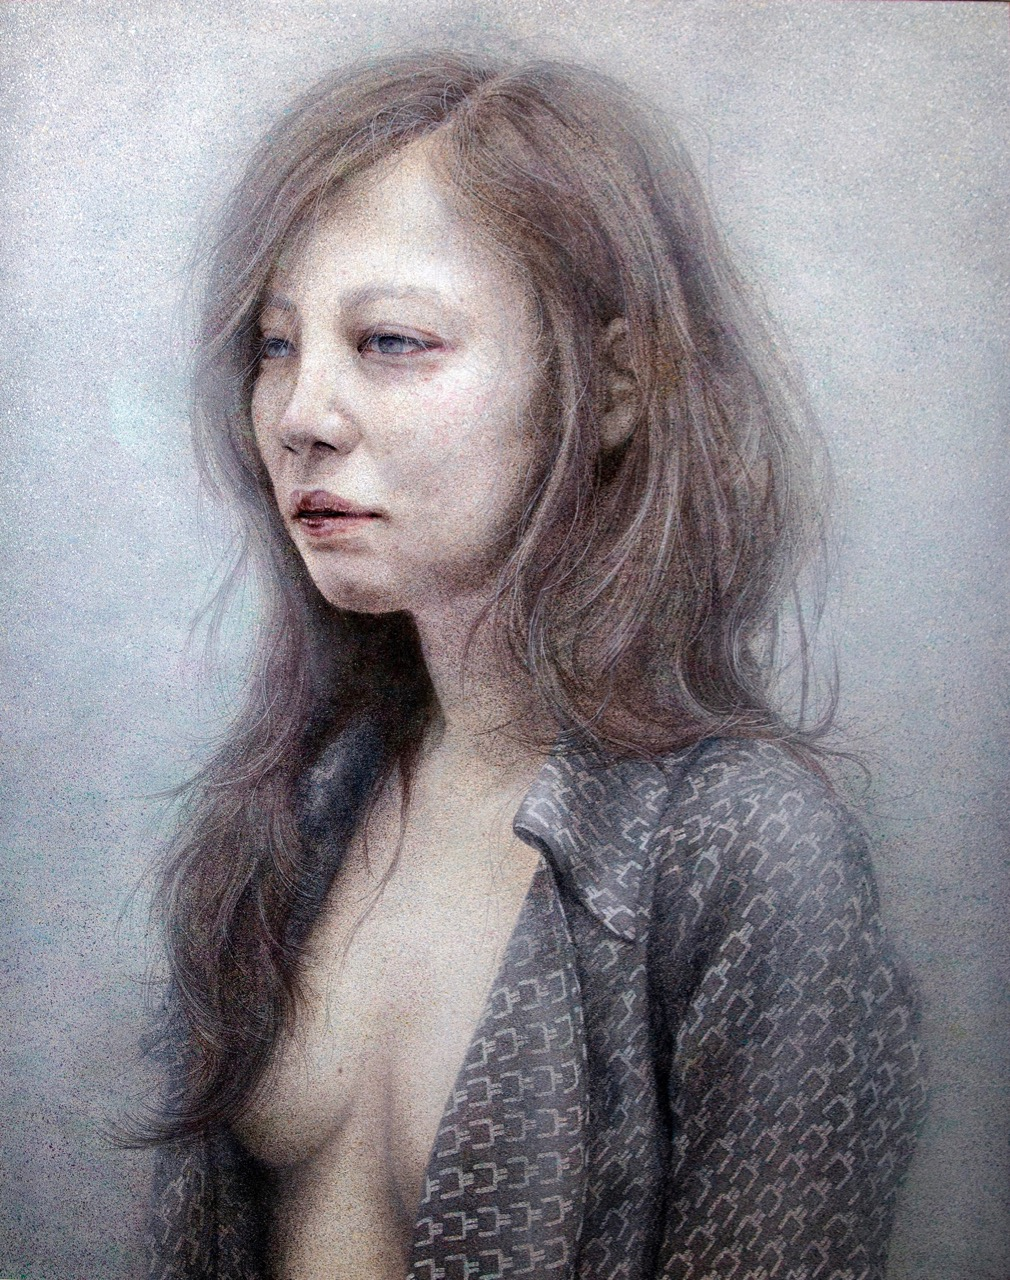 NACHI Satoko